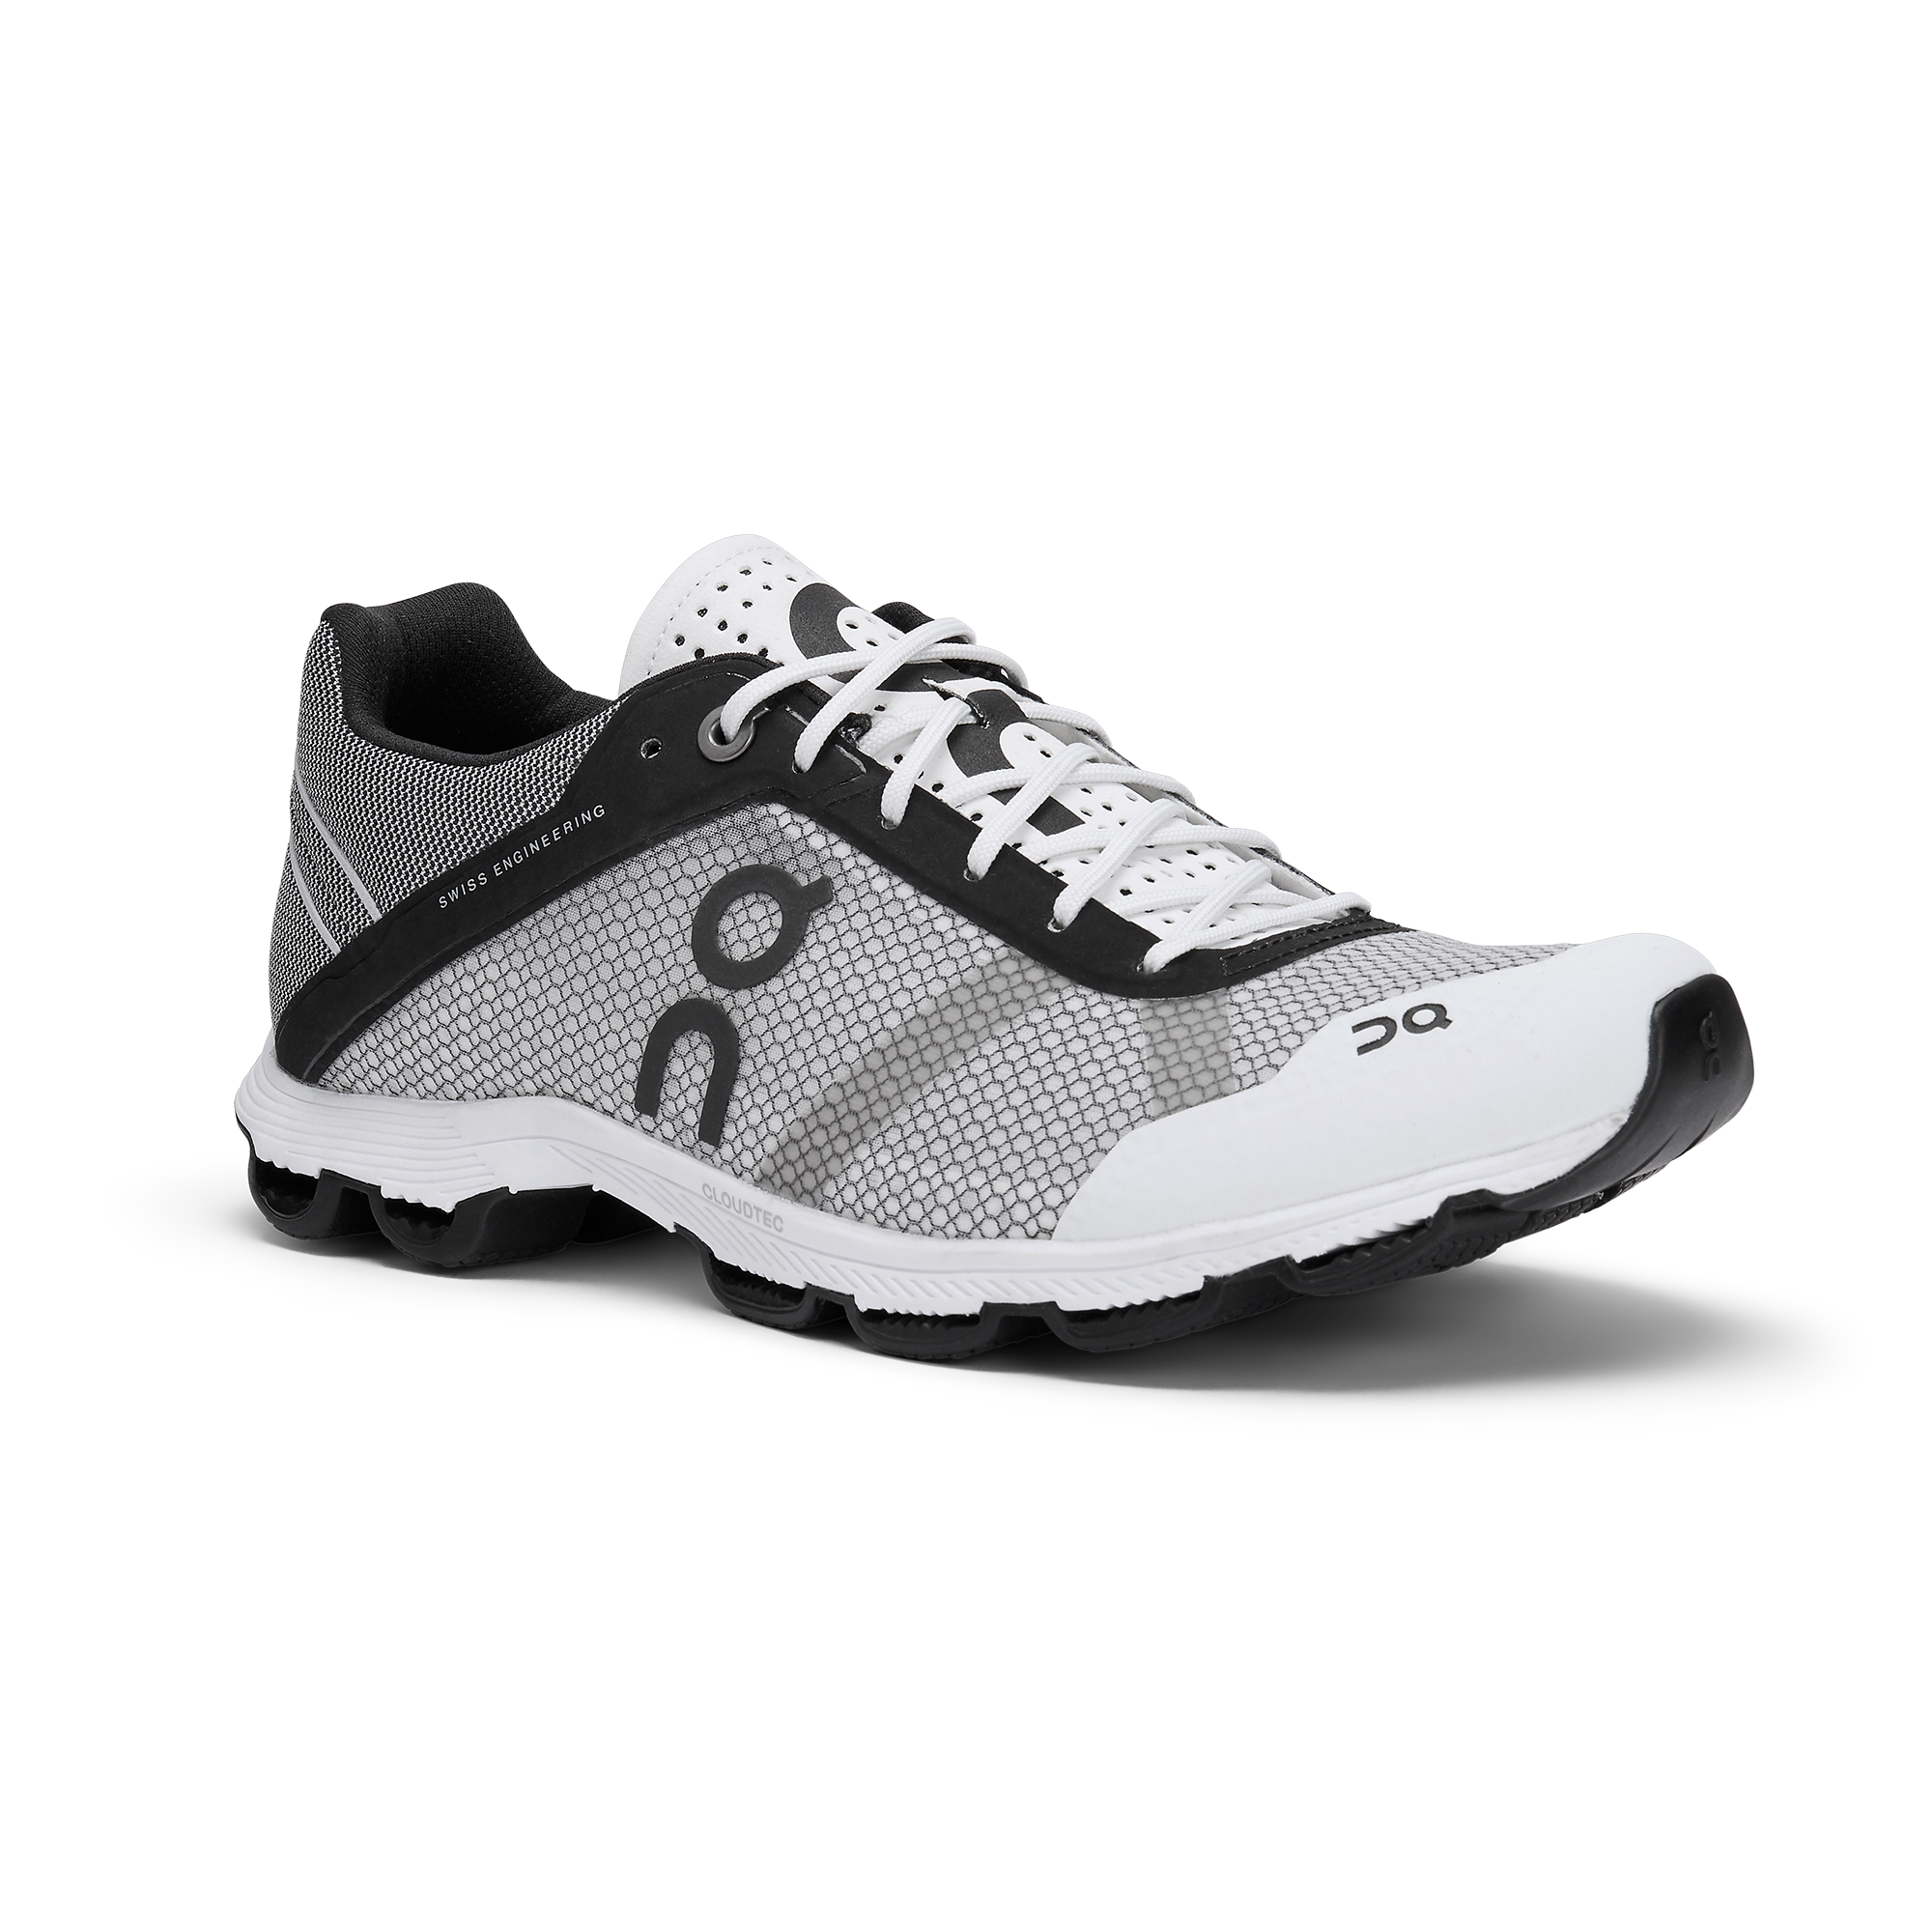 Cloudrush - Race Running Shoe | On